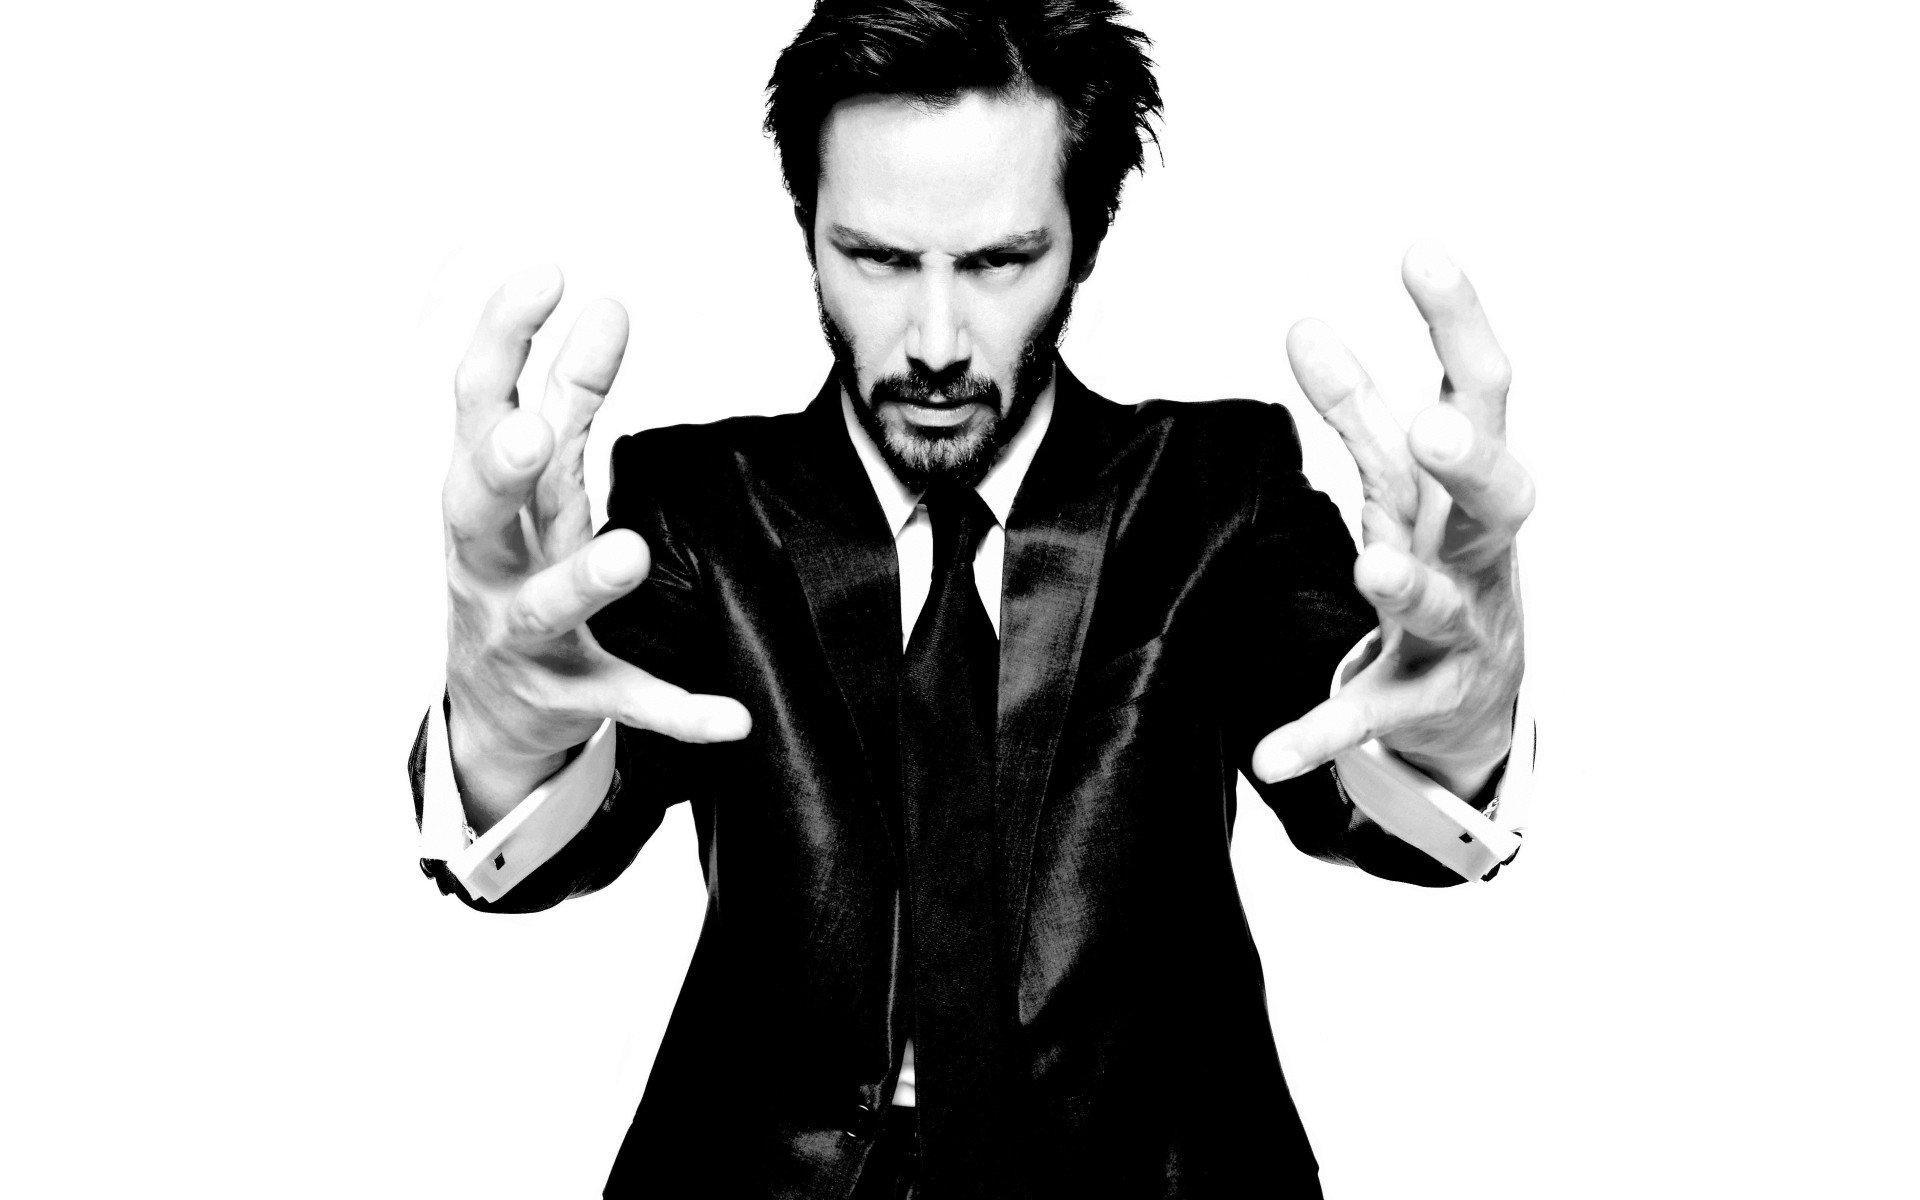 black and white suit hands men celebrity keanu reeves beard actors